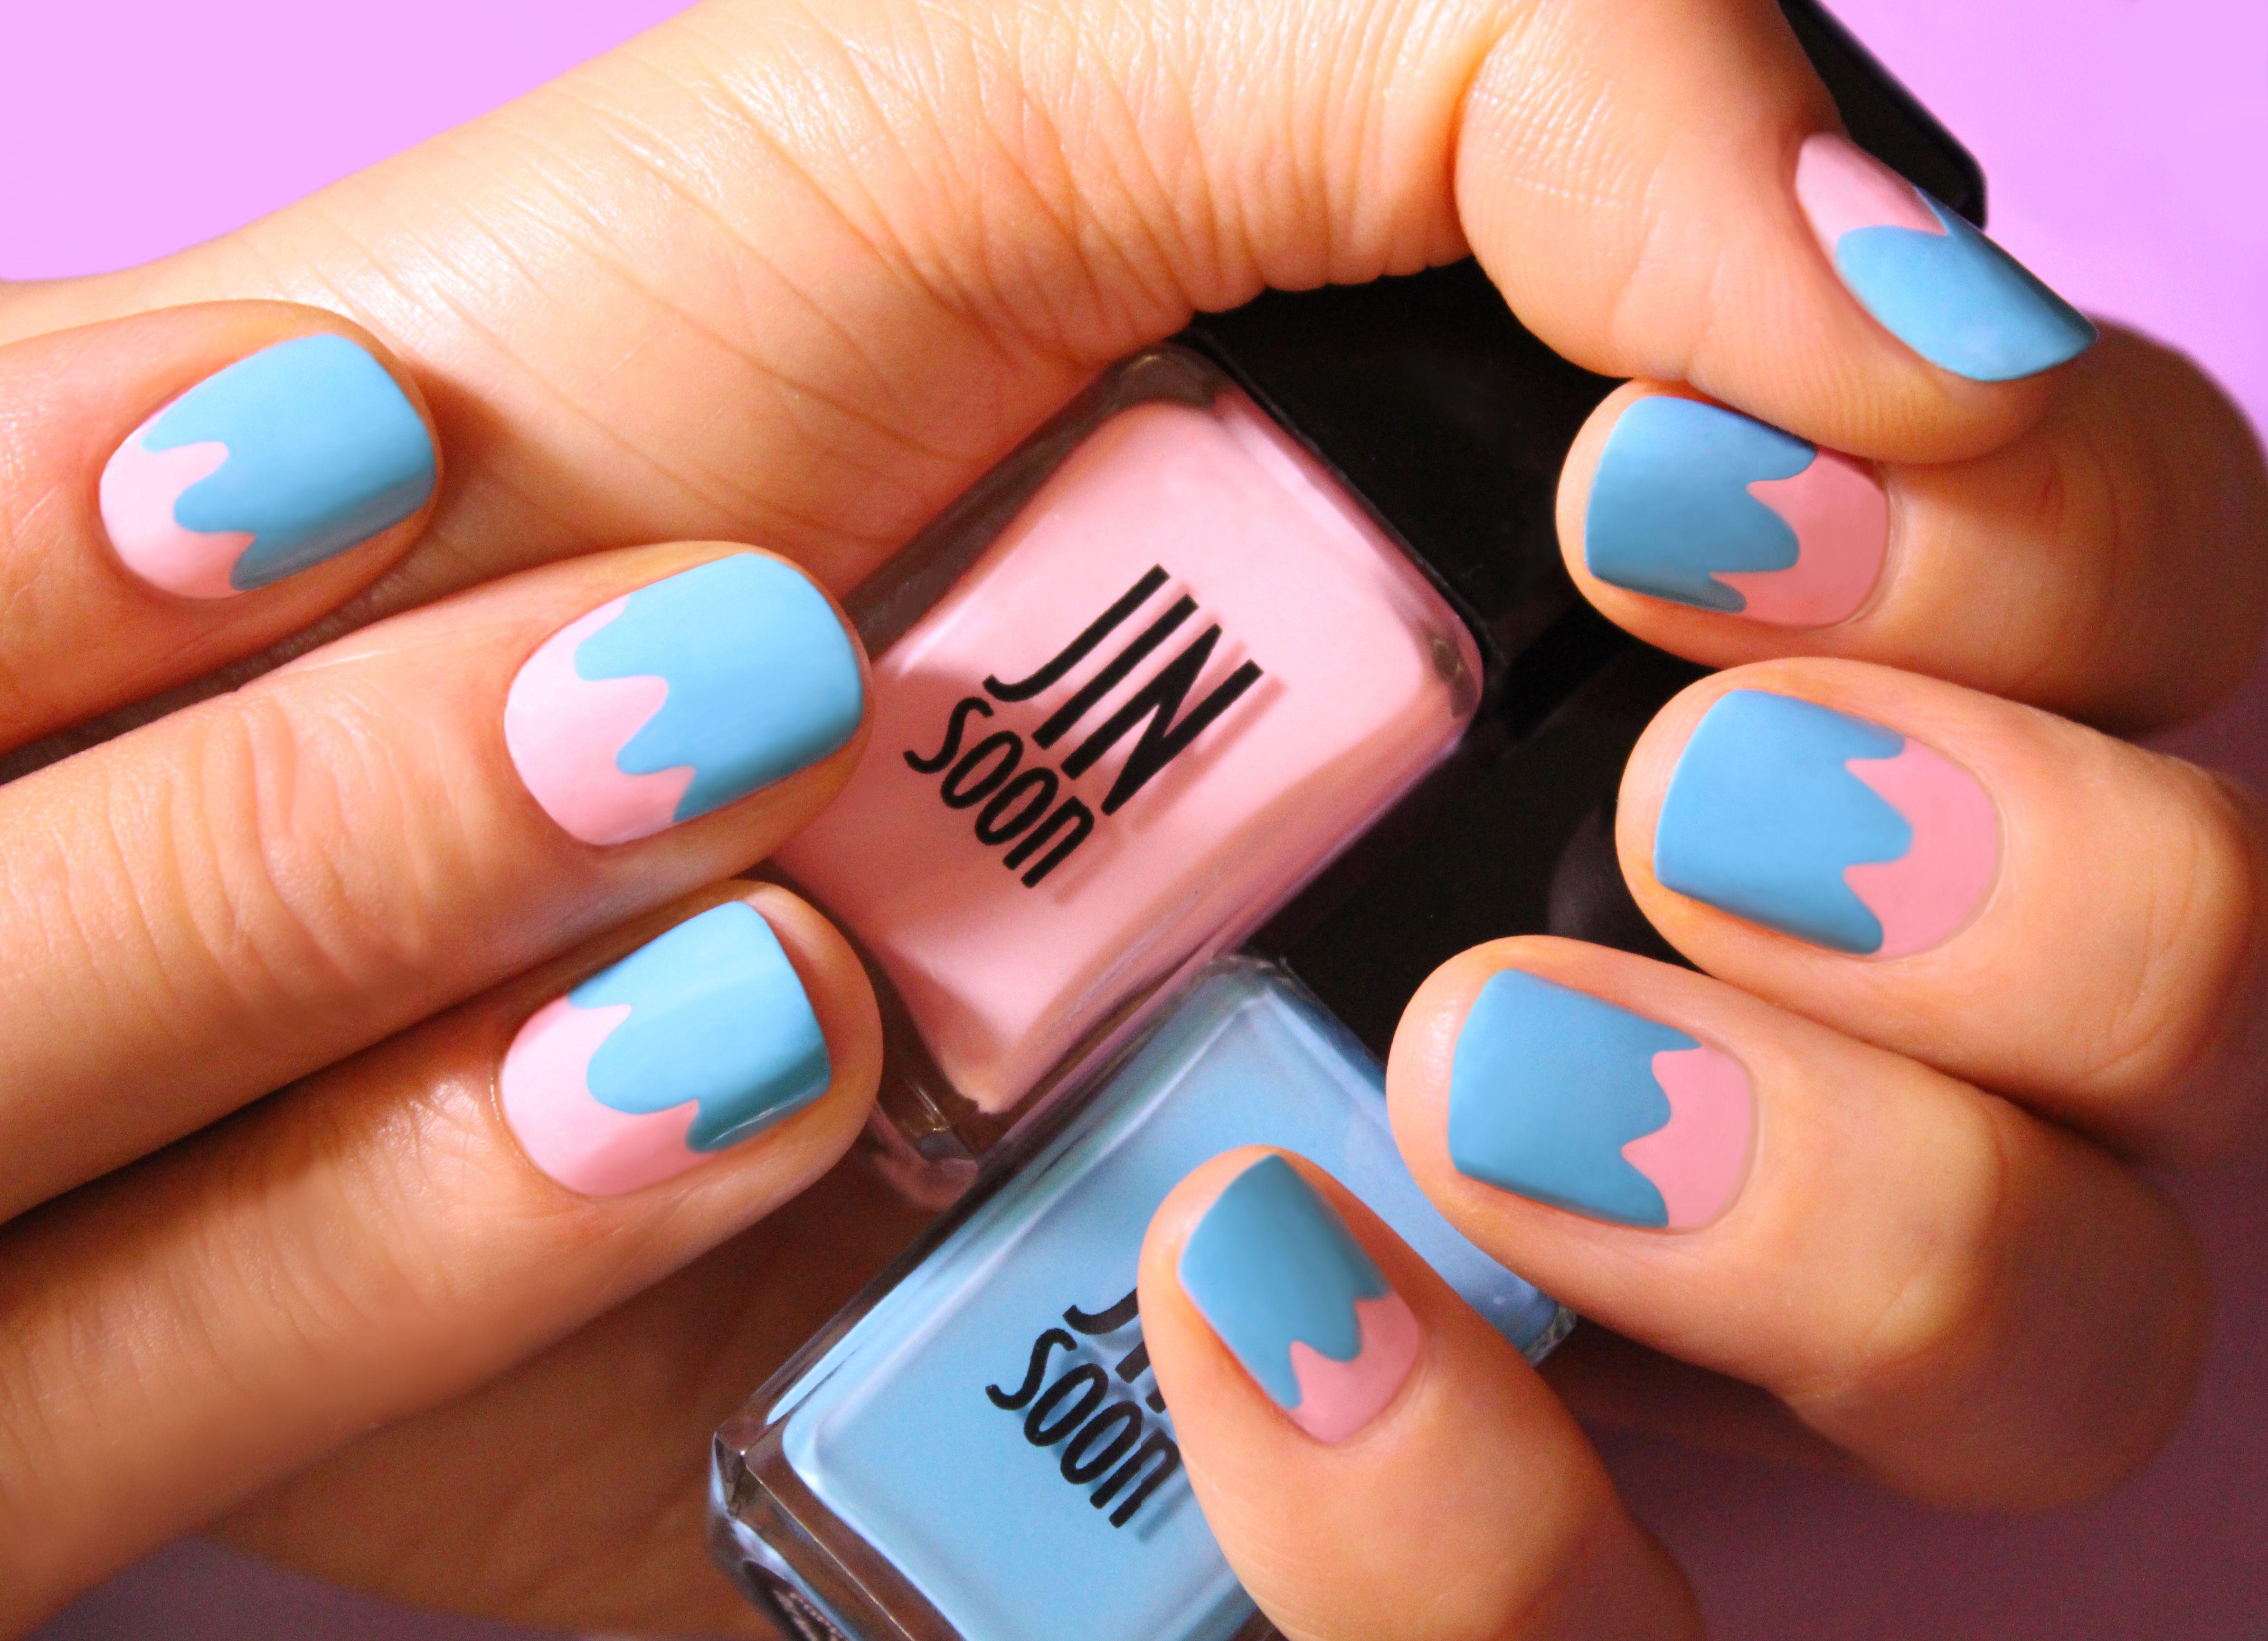 Pretty Pastel Nails | Nailed It! | Pinterest | Pastel nails, Sephora ...